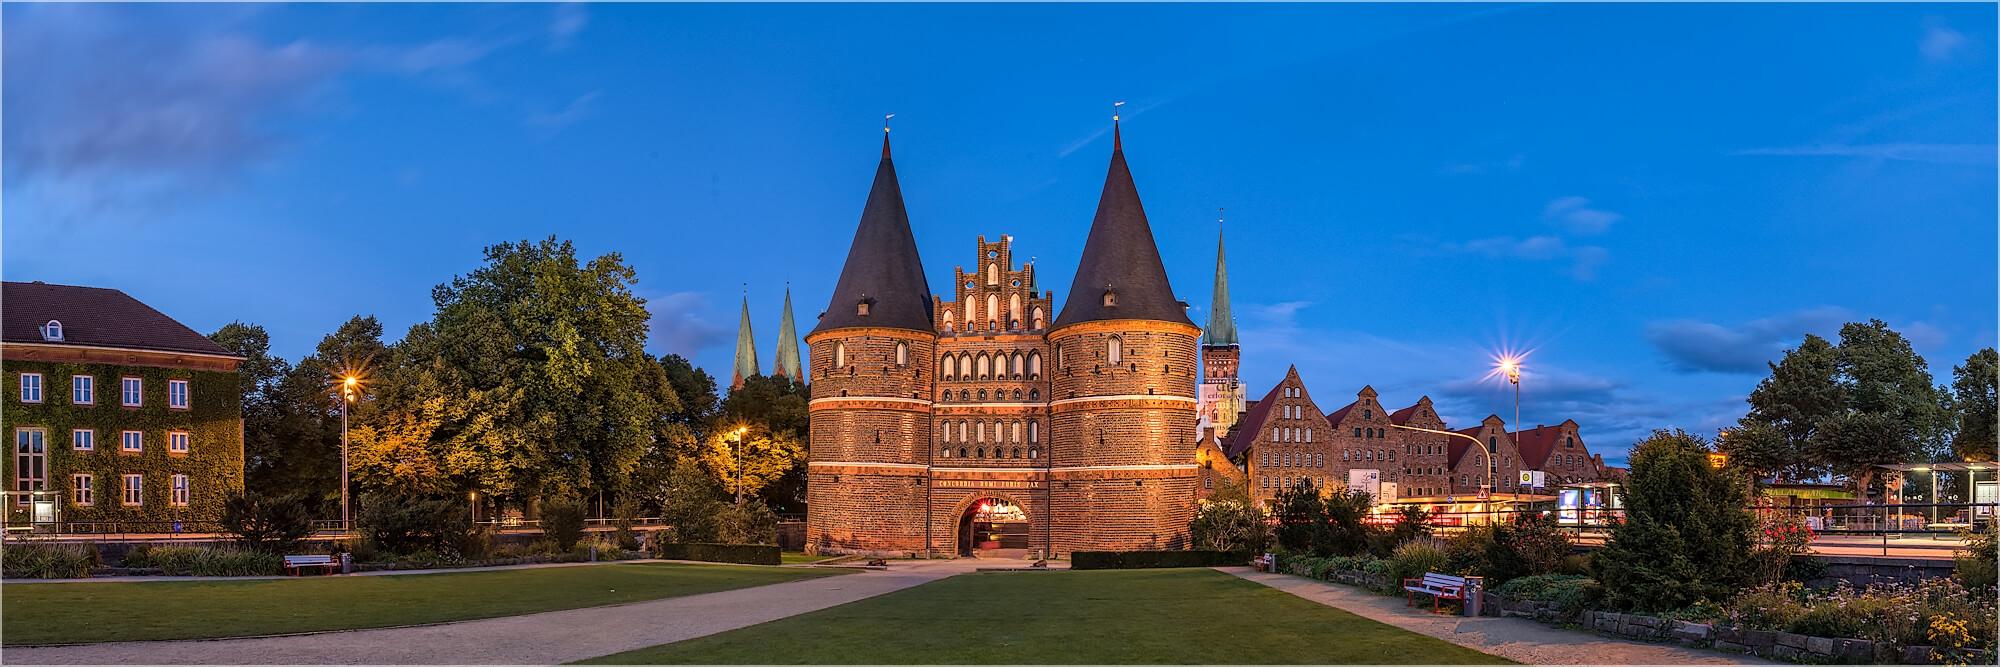 Panoramabild Lübeck Lübecker Holstentor